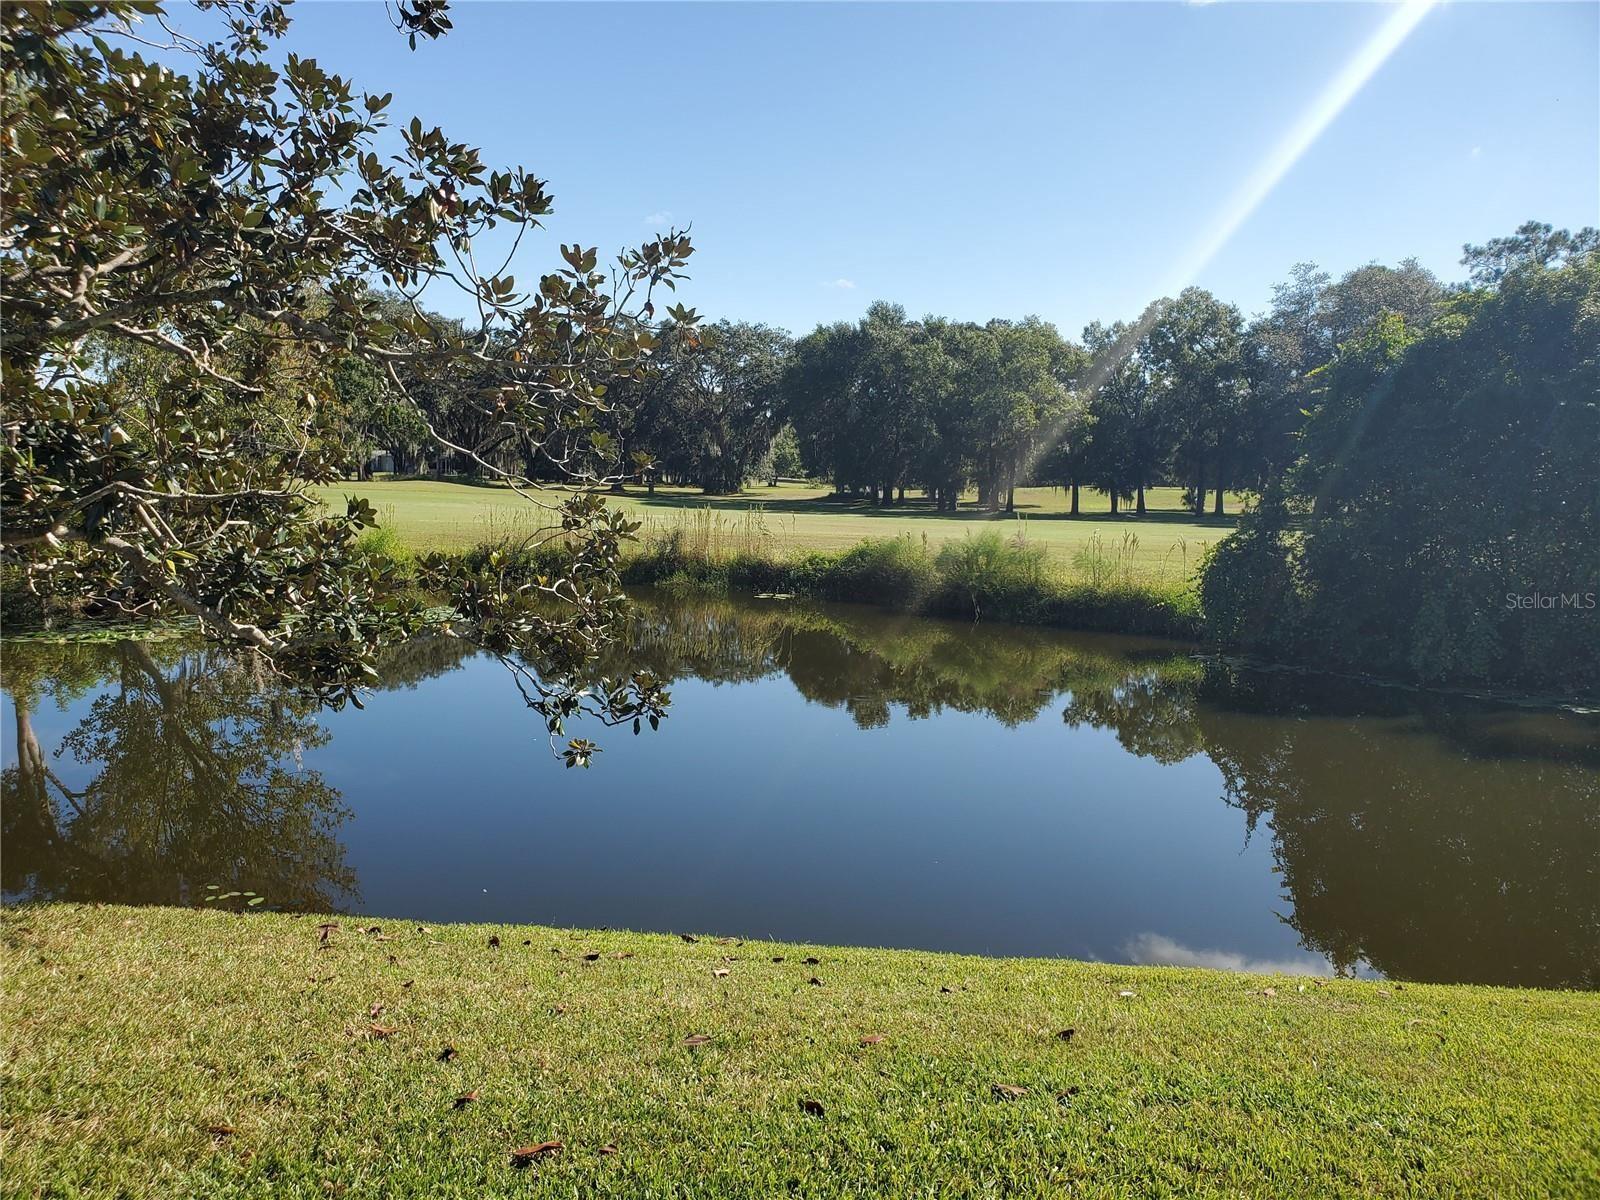 Photo of 1720 PALMER COURT, PALM HARBOR, FL 34685 (MLS # W7839067)